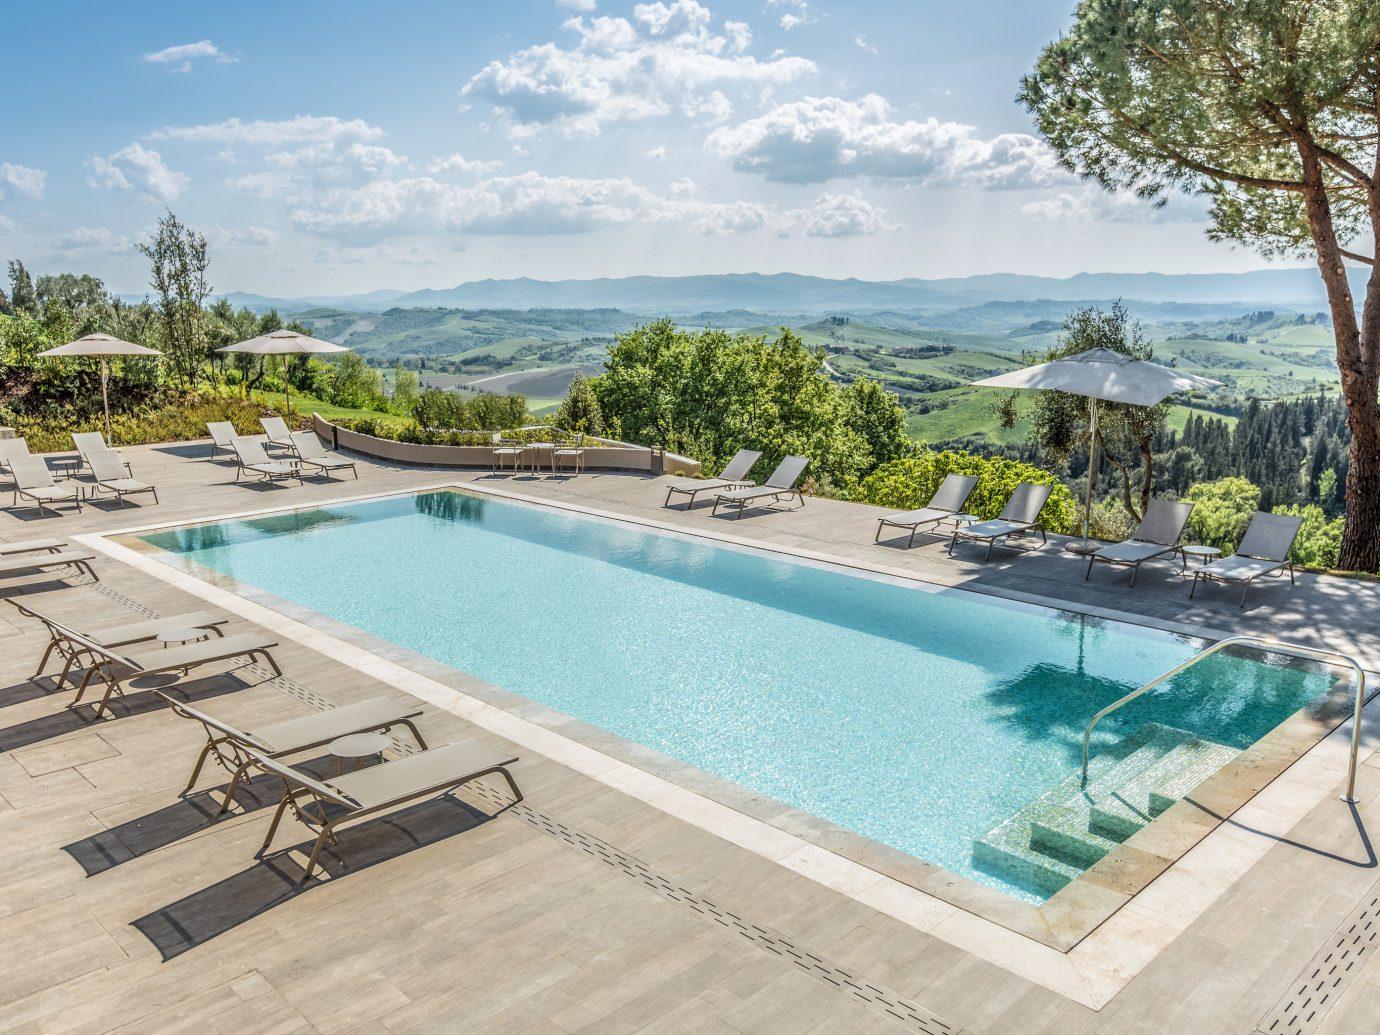 Italy Trip Ideas swimming pool property Resort leisure estate real estate resort town vacation Villa tourism bay amenity